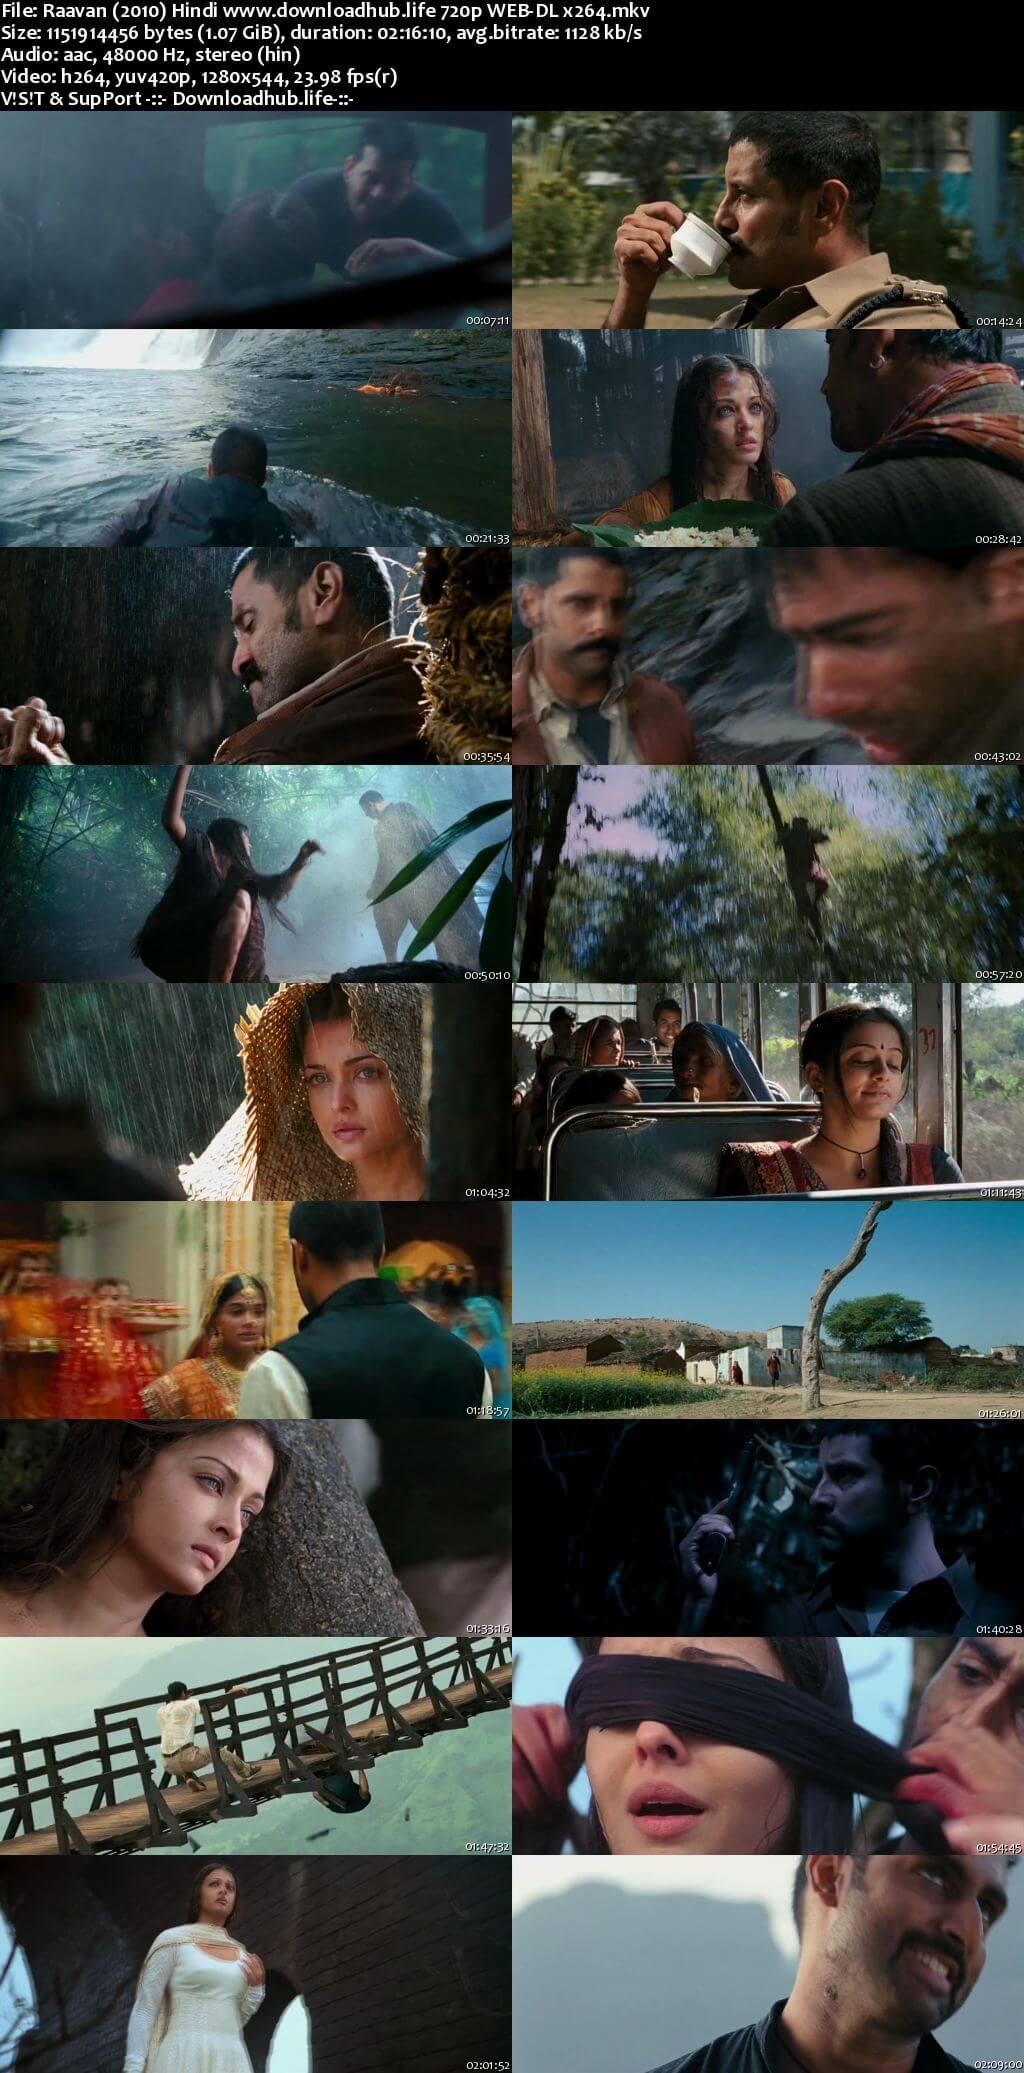 Raavan 2010 Hindi 720p HDRip x264